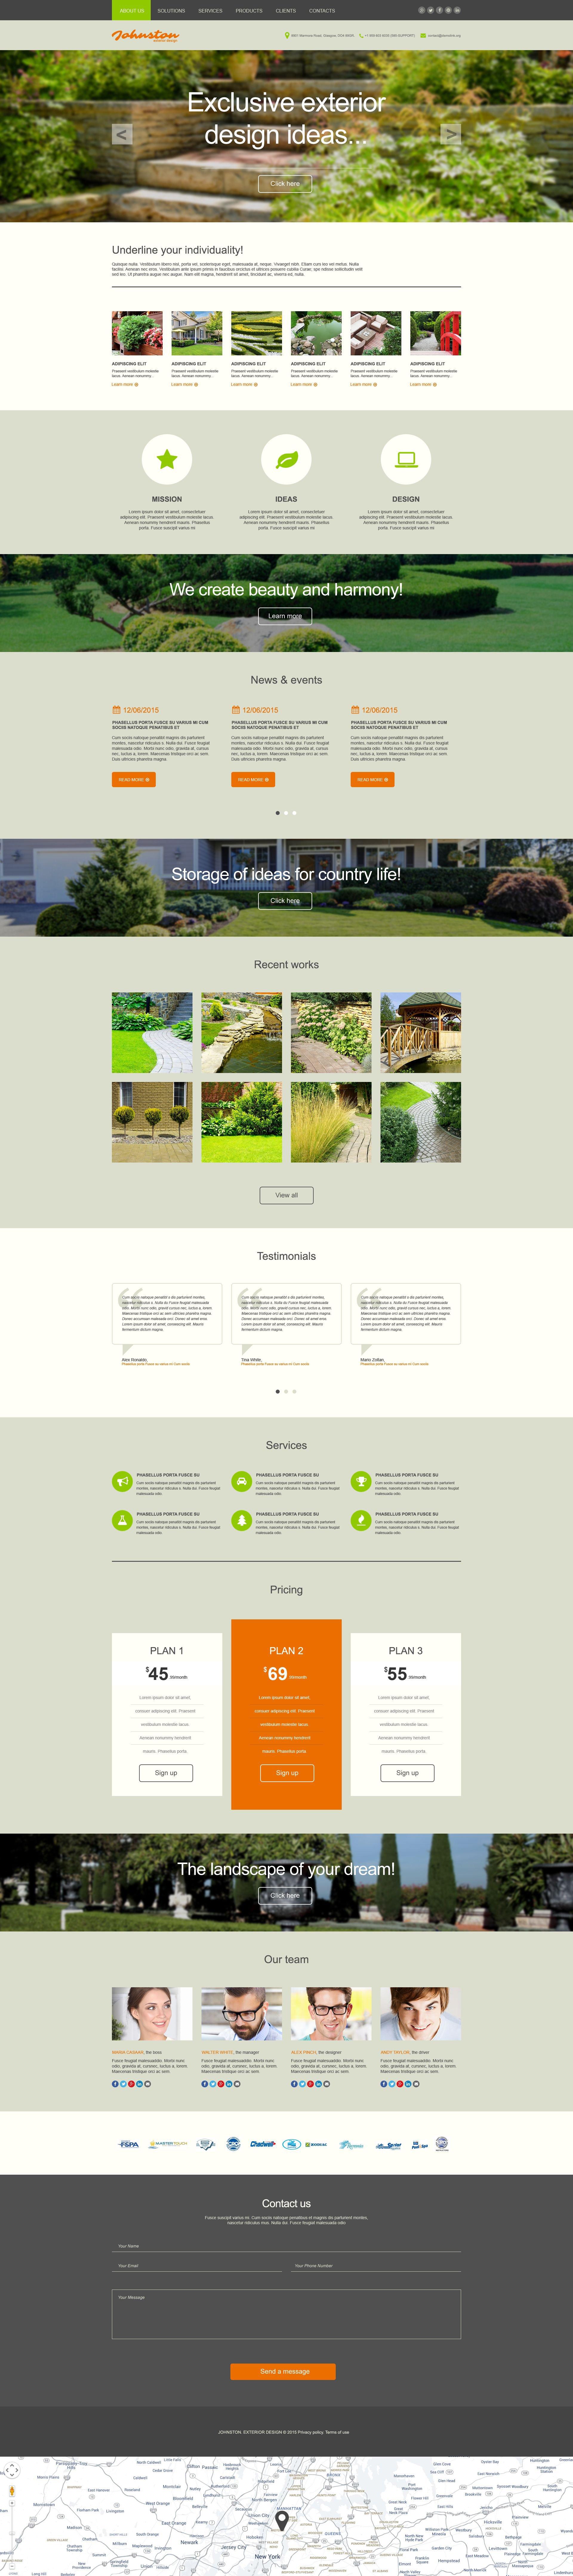 Plantilla Muse #53338 para Sitio de Diseño de exteriores